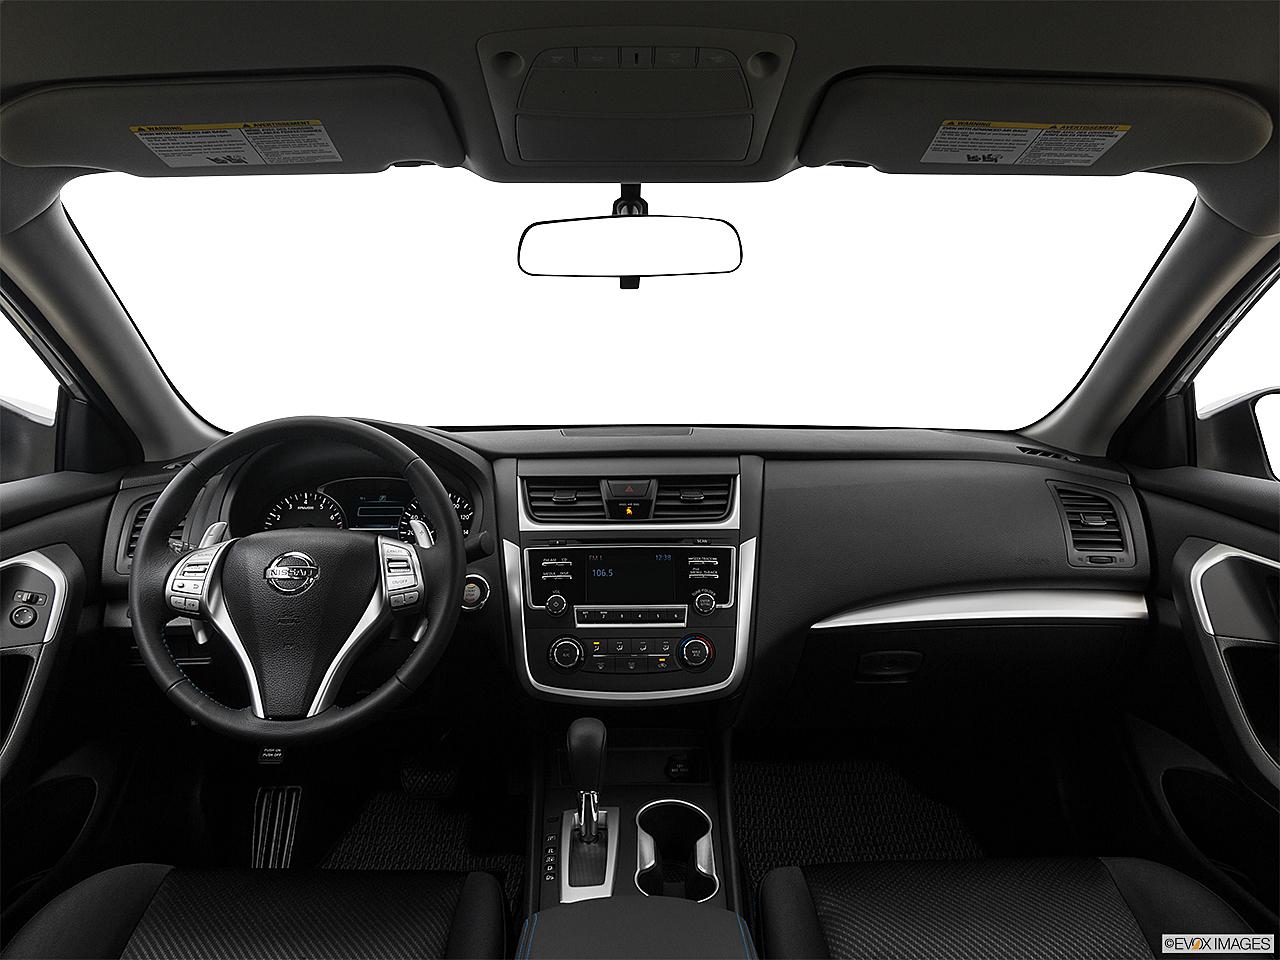 2017 Nissan Altima 2 5 Sr Centered Wide Dash Shot